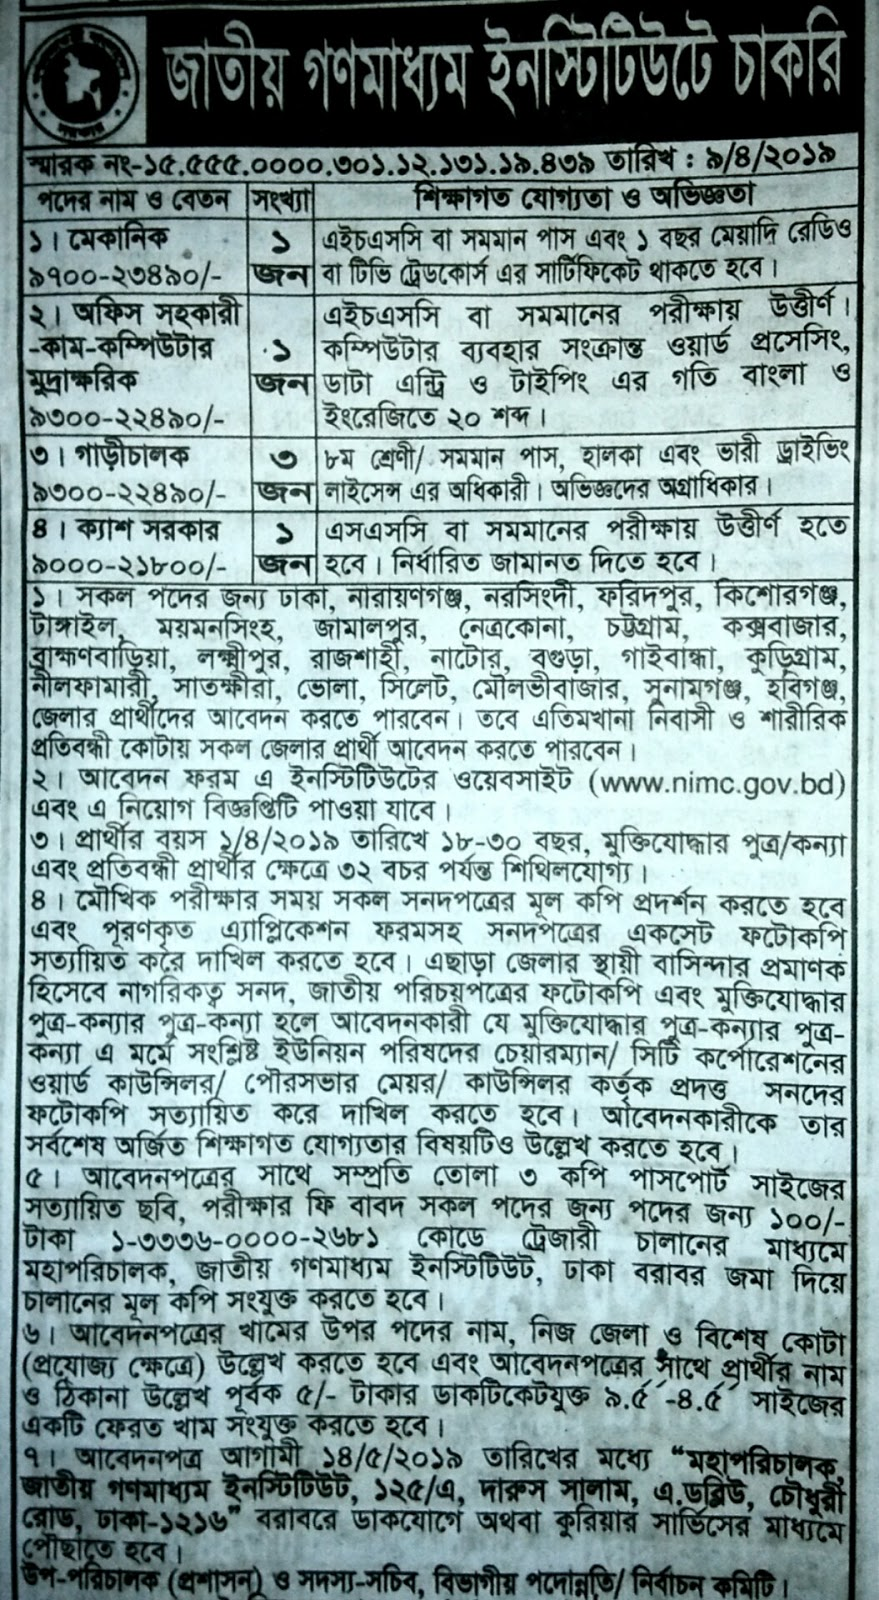 National Institute of Mass Media job circular 2019. জাতীয় গণমাধ্যম ইনস্টিটিউট নিয়োগ বিজ্ঞপ্তি ২০১৯